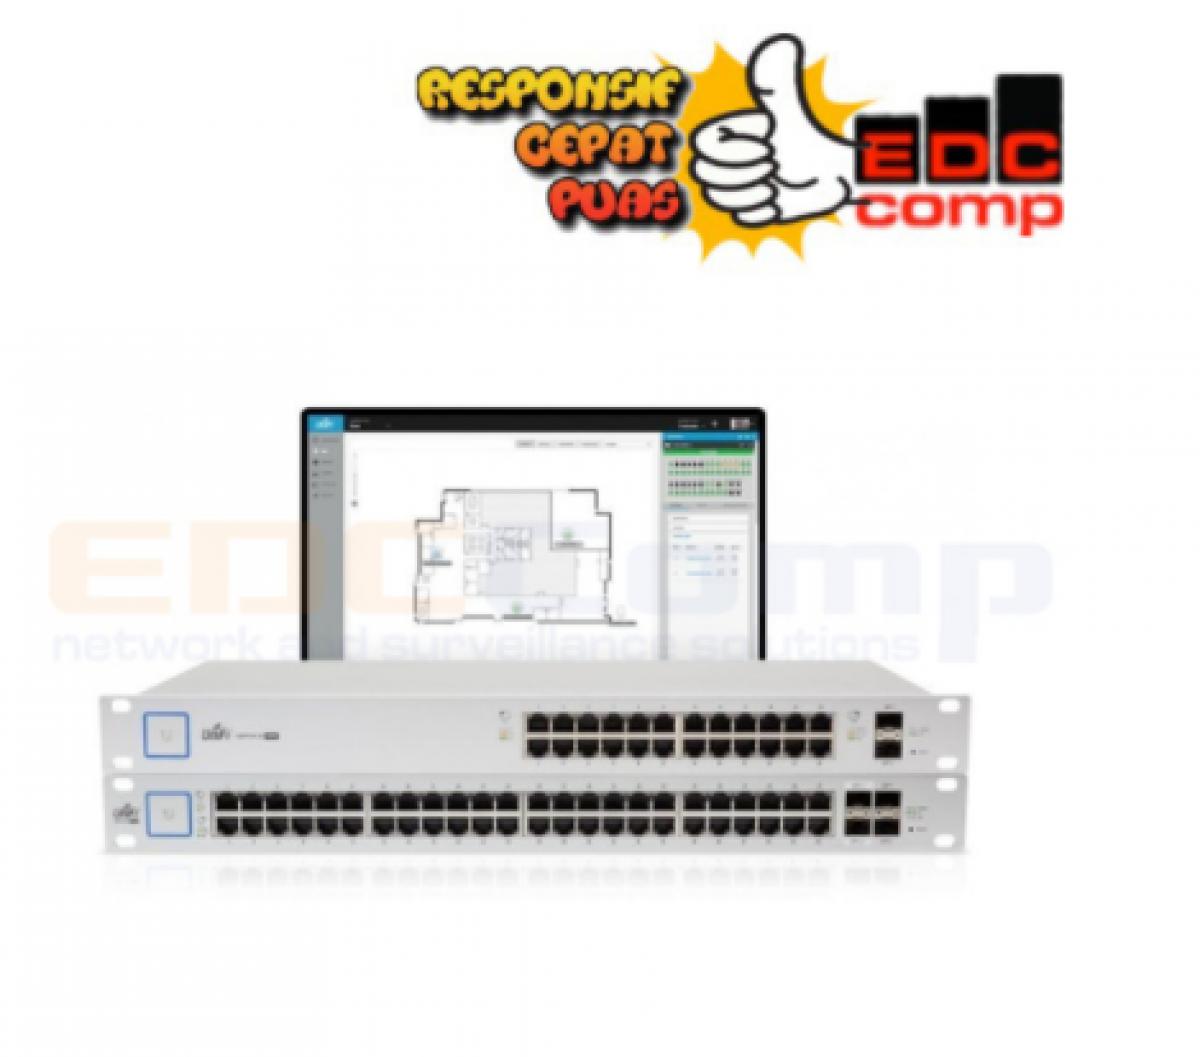 Ubiquiti US-48-500W UniFi Switch PoE+ 48 Gigabit 500W with SFP - EdcComp